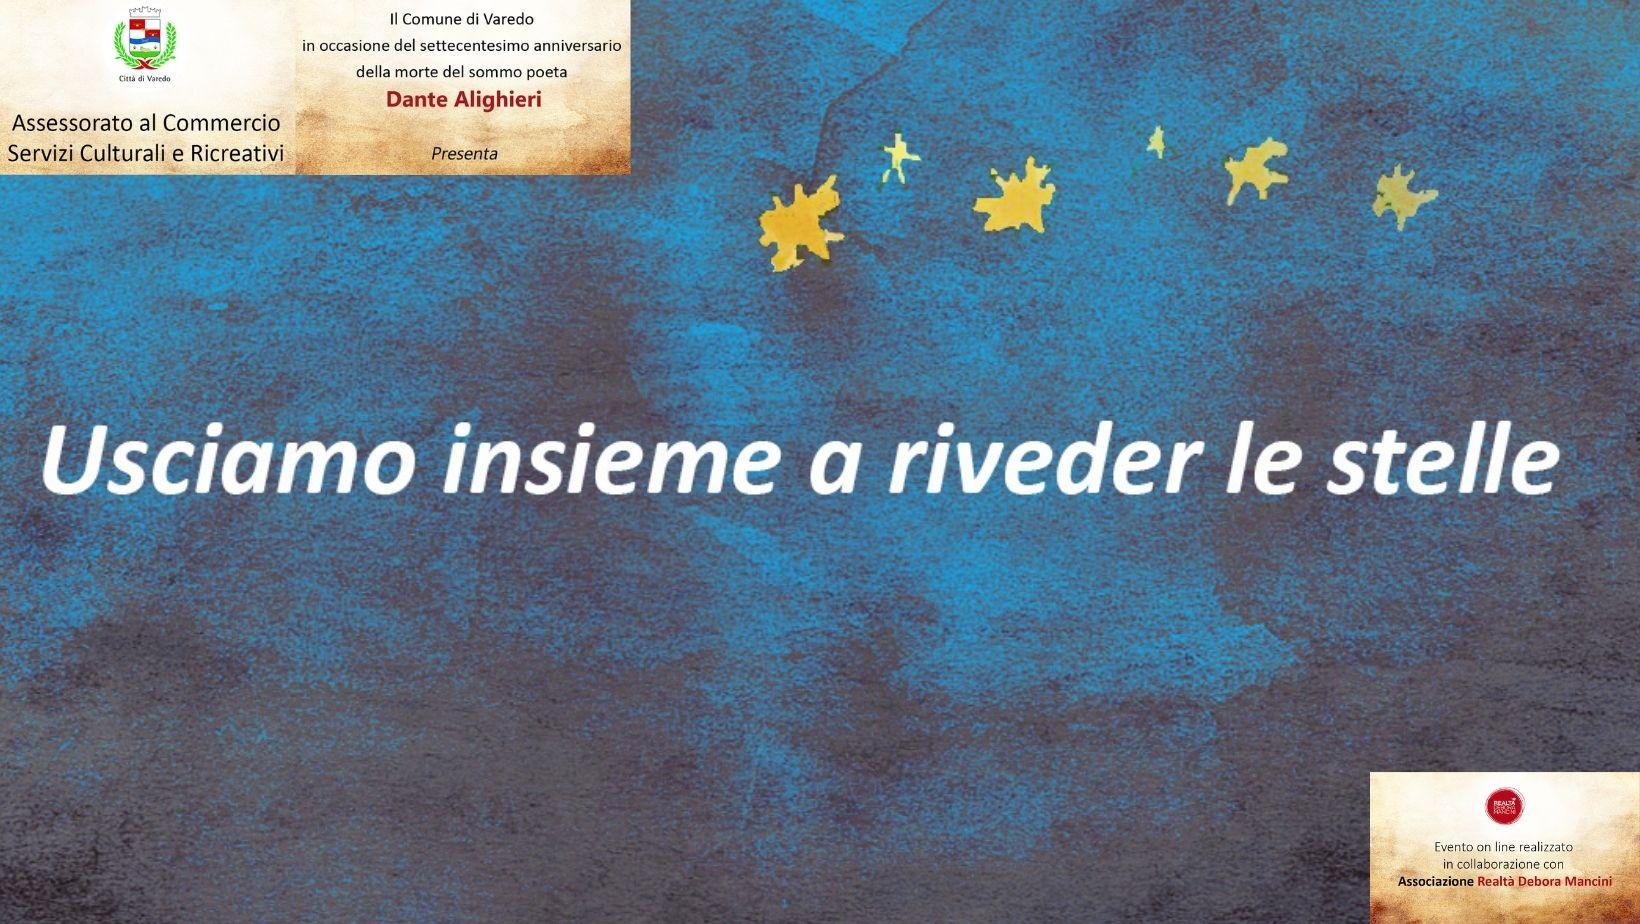 USCIAMO INSIEME A RIVEDER LE STELLE @Varedo